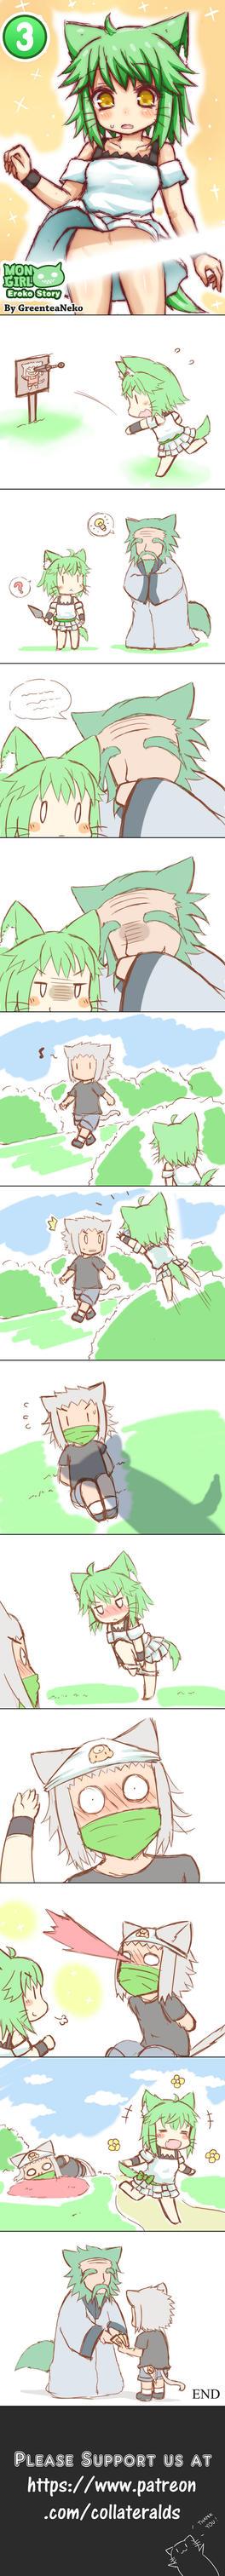 MonGirl Eroko Chapter 3 by GreenTeaNeko